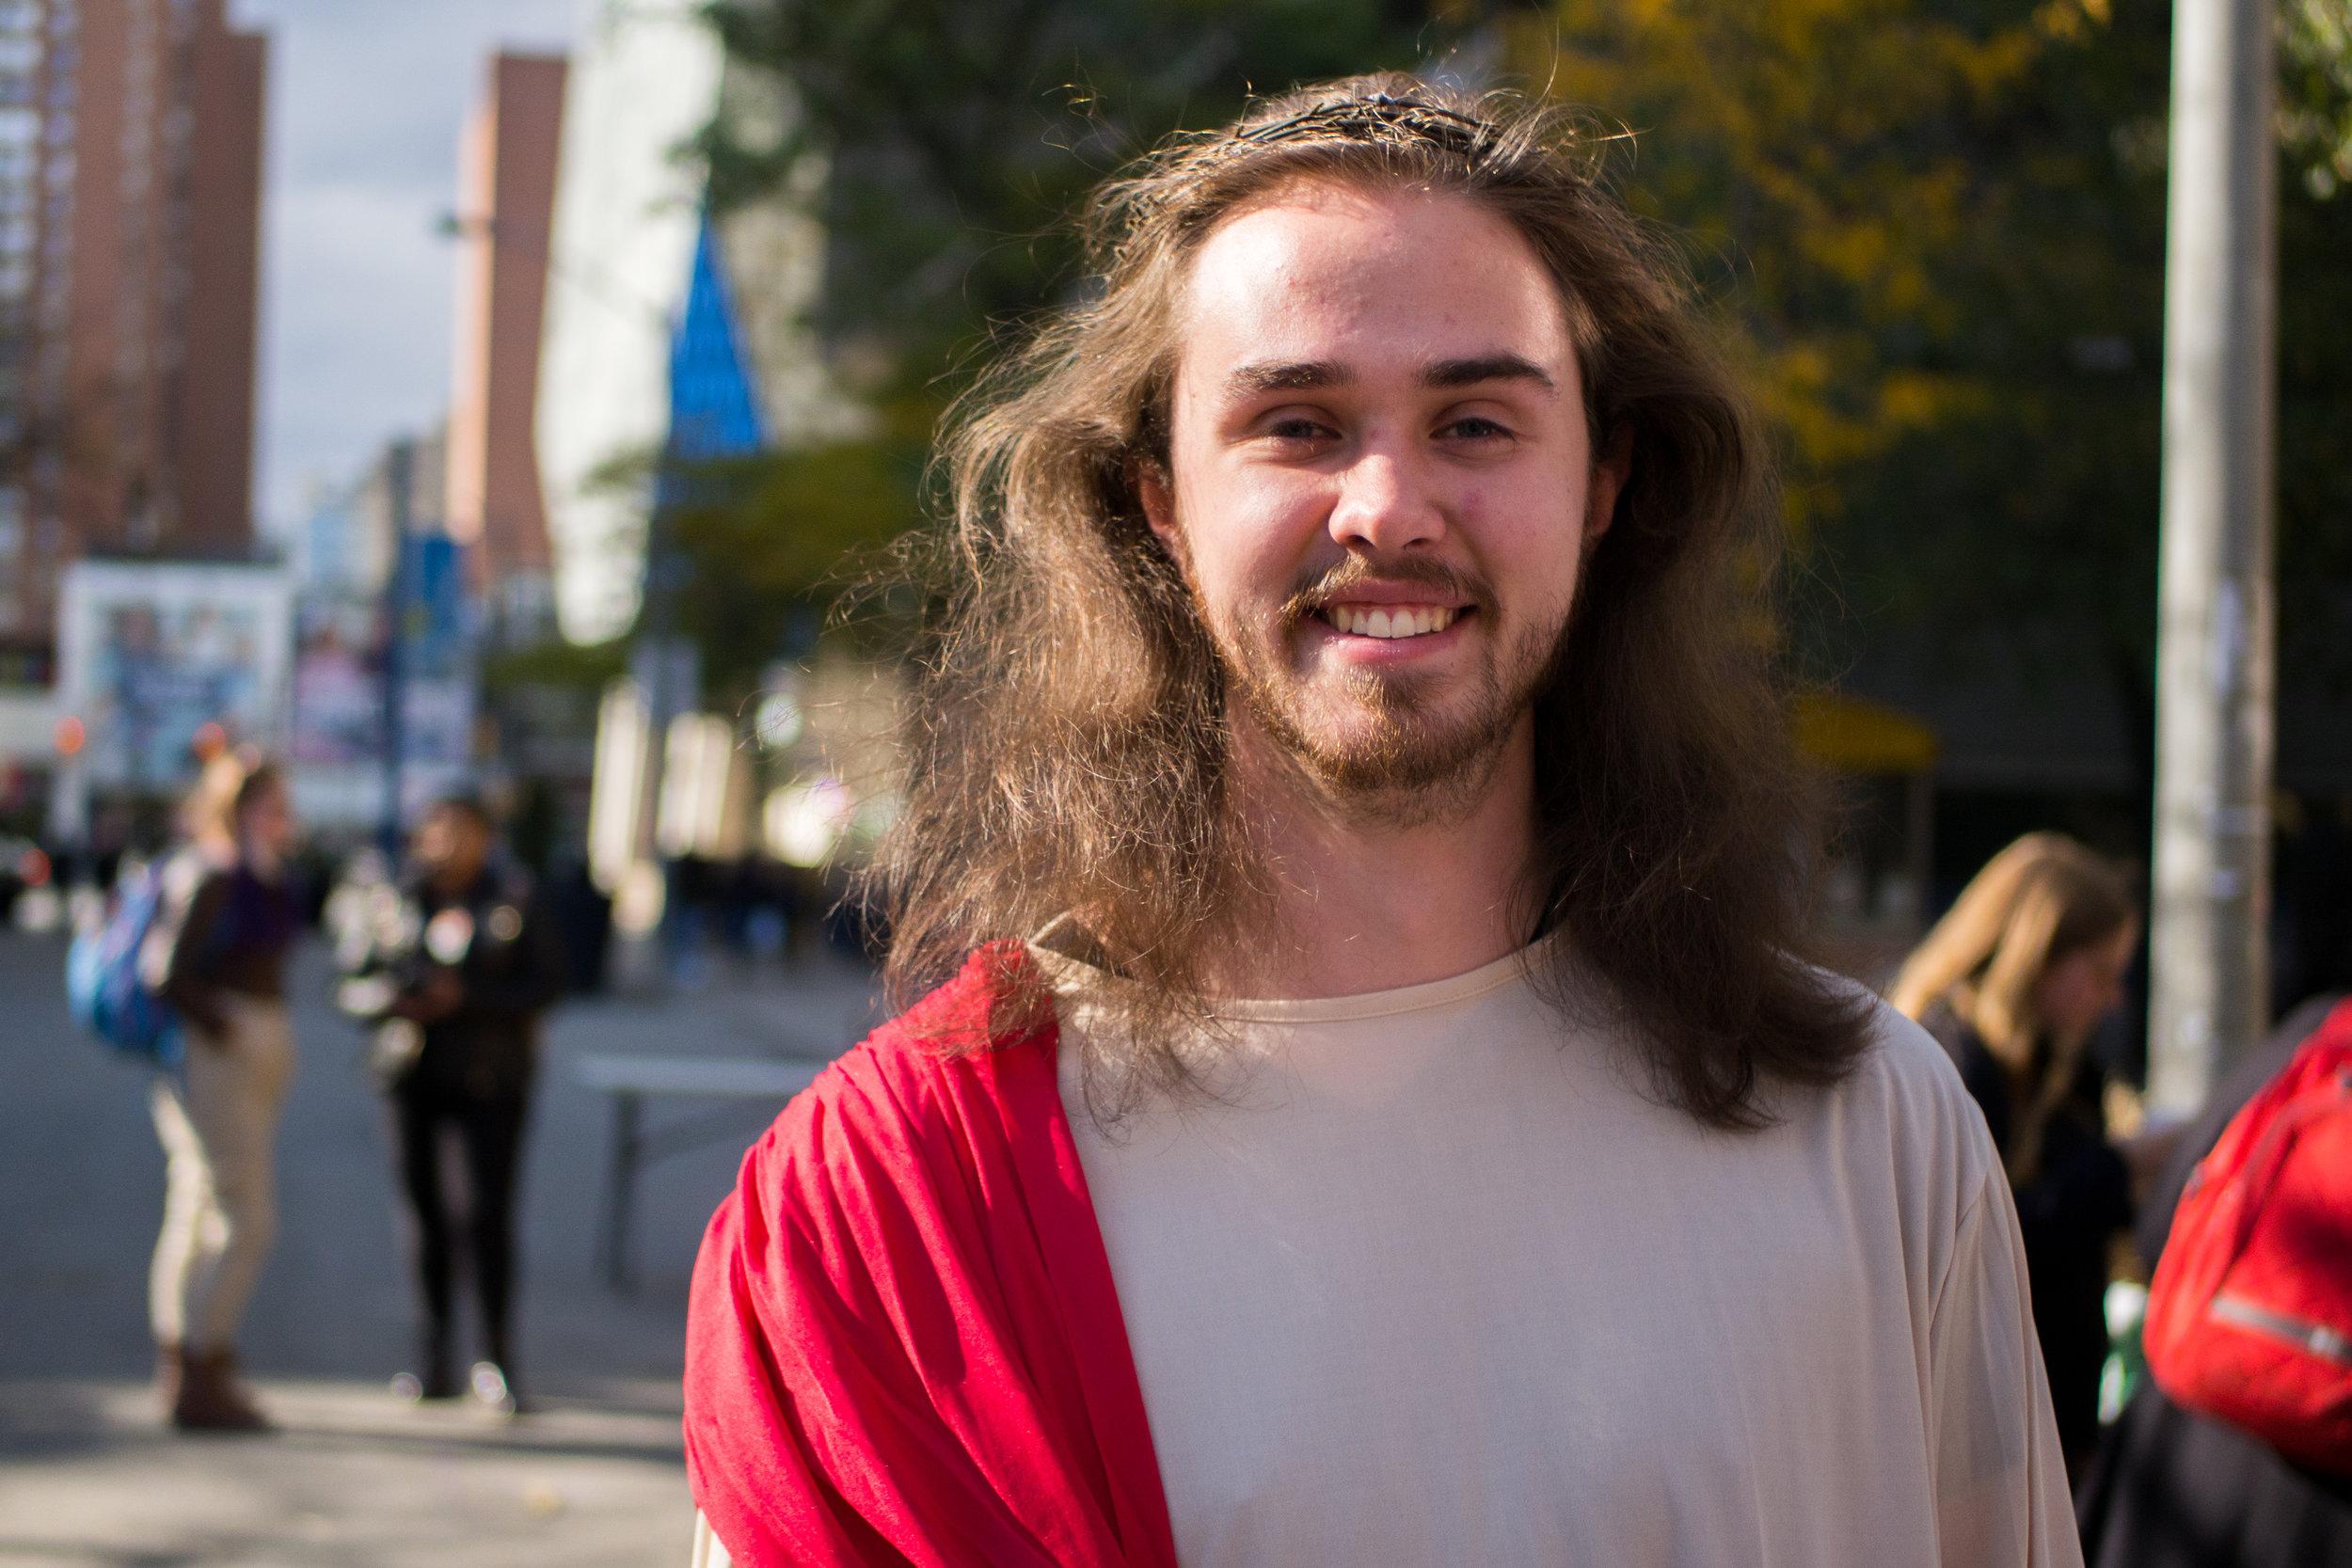 John Corkill, 20, walks around campus in his Jesus costume. (J. Cameron/CanCulture)